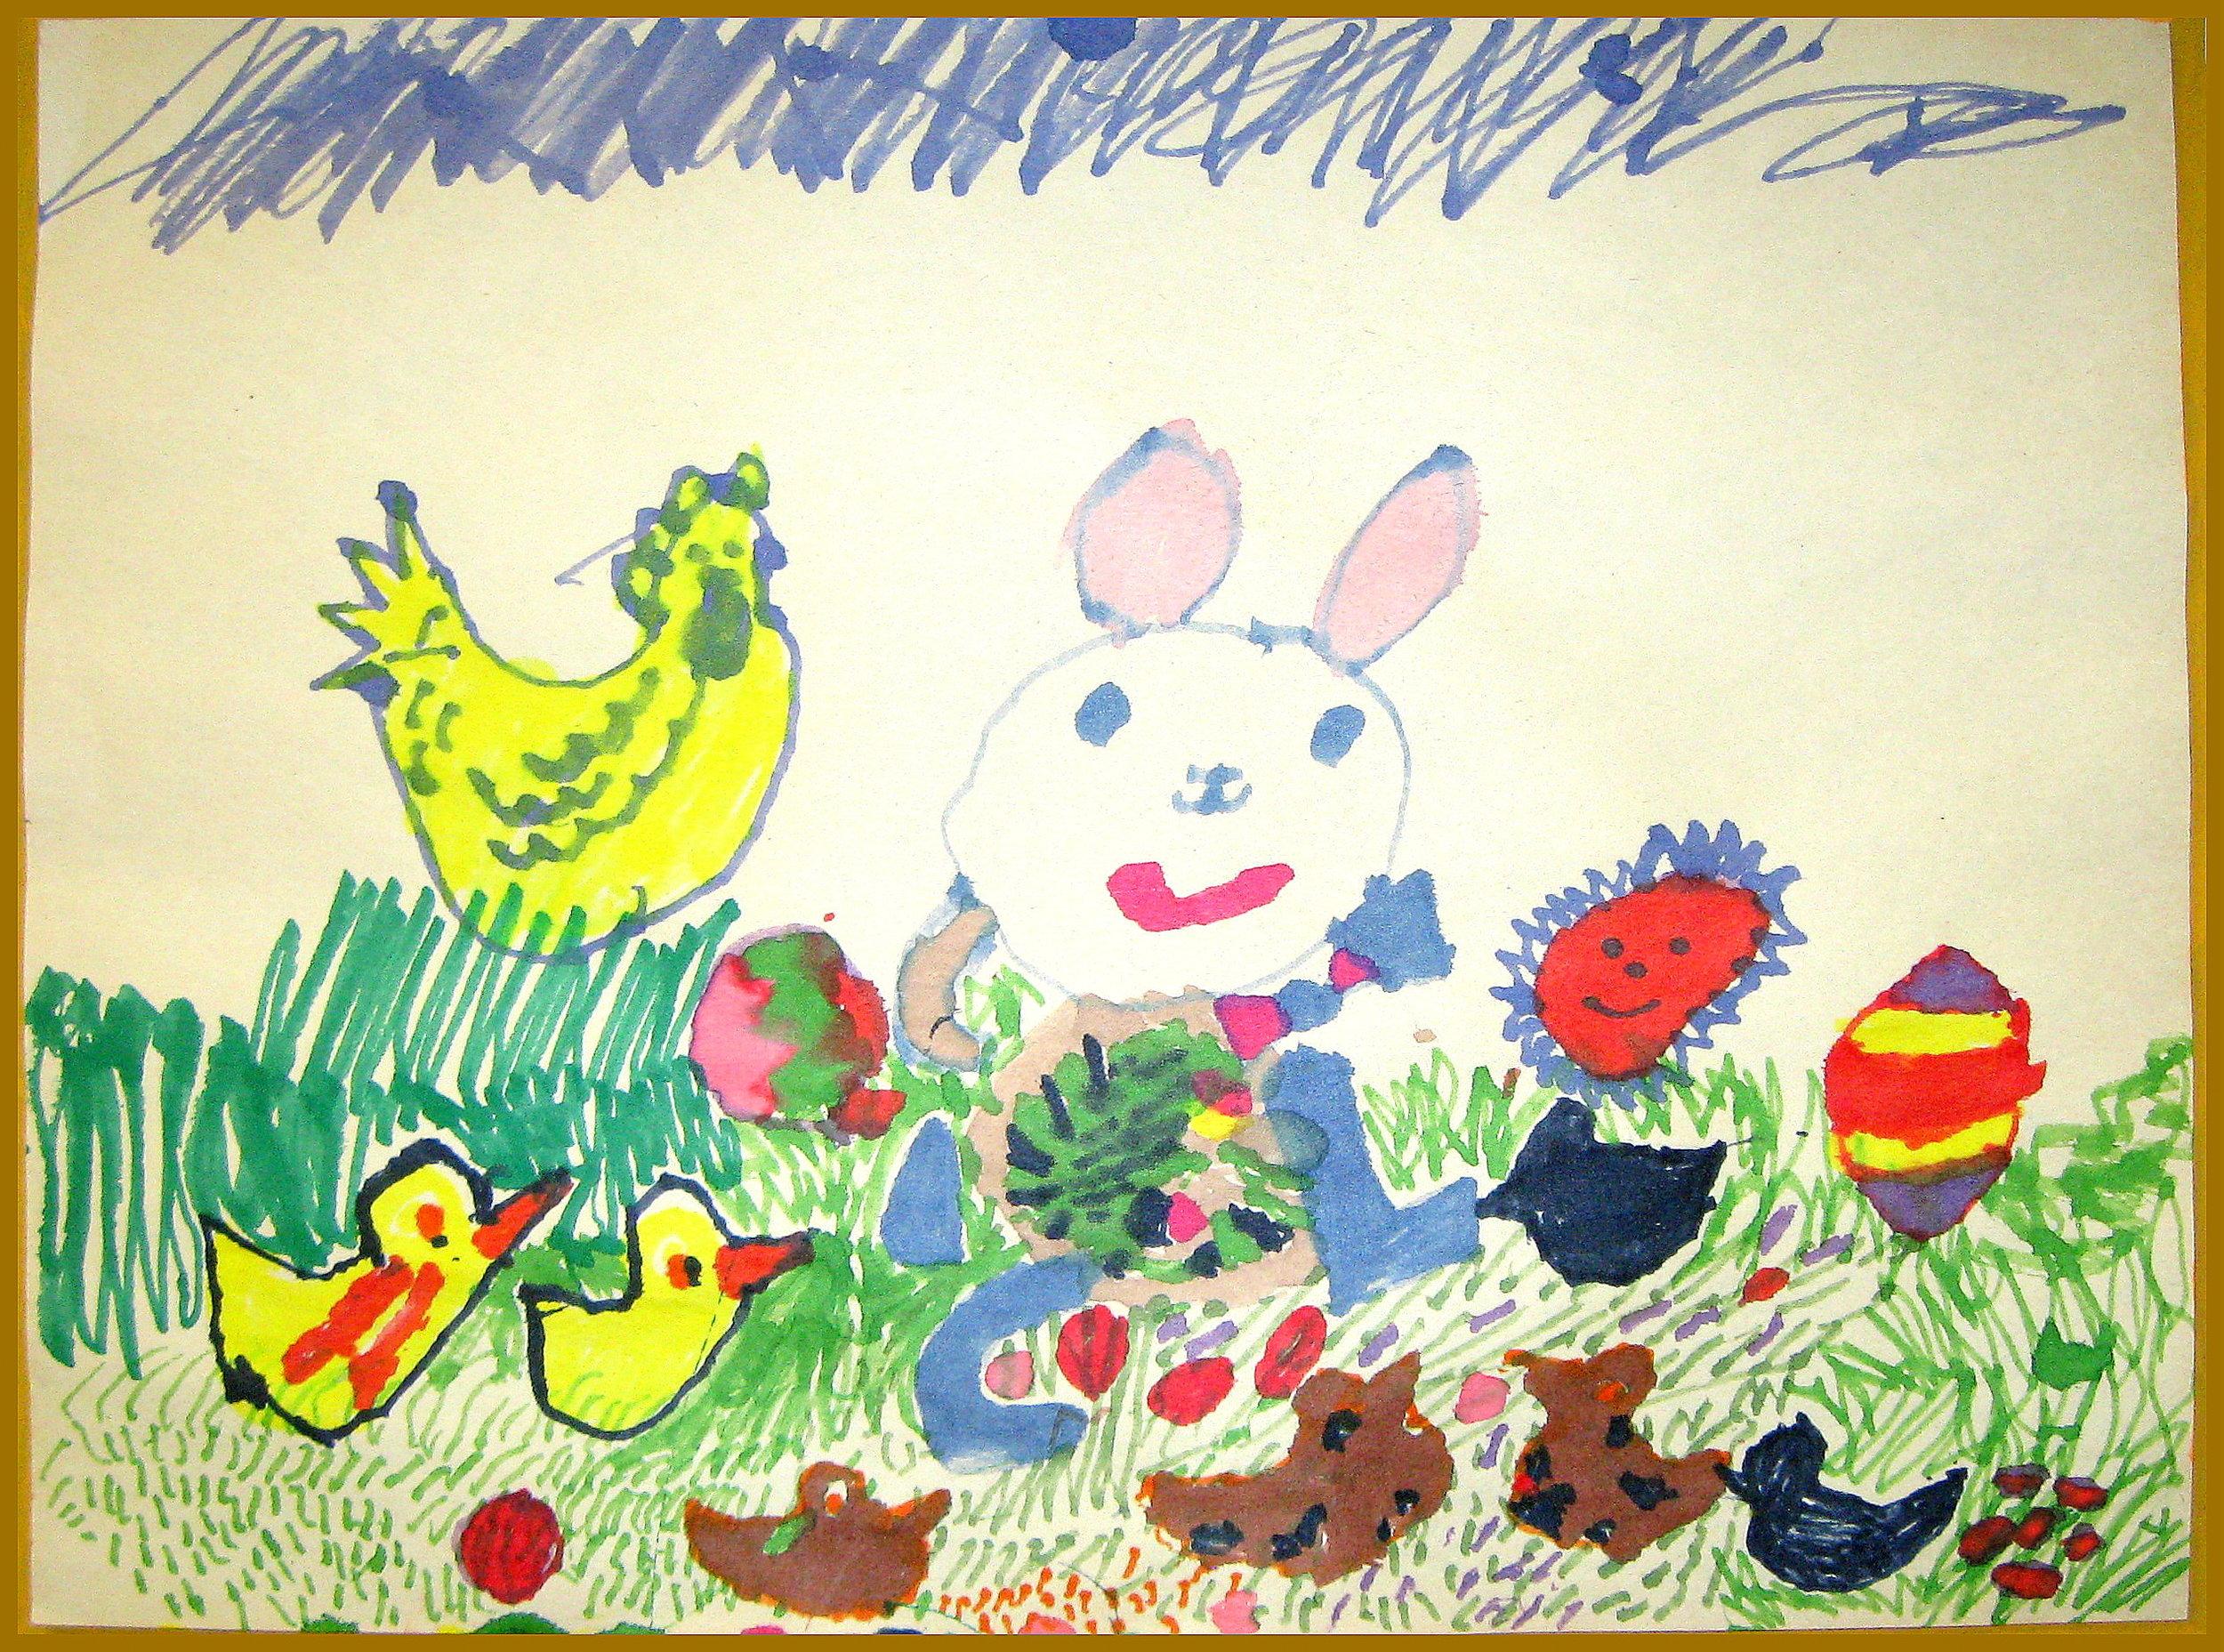 Easter Time Vivian Hahn date unknown Color Pencil & Marker on Paper prints $20/originals $50